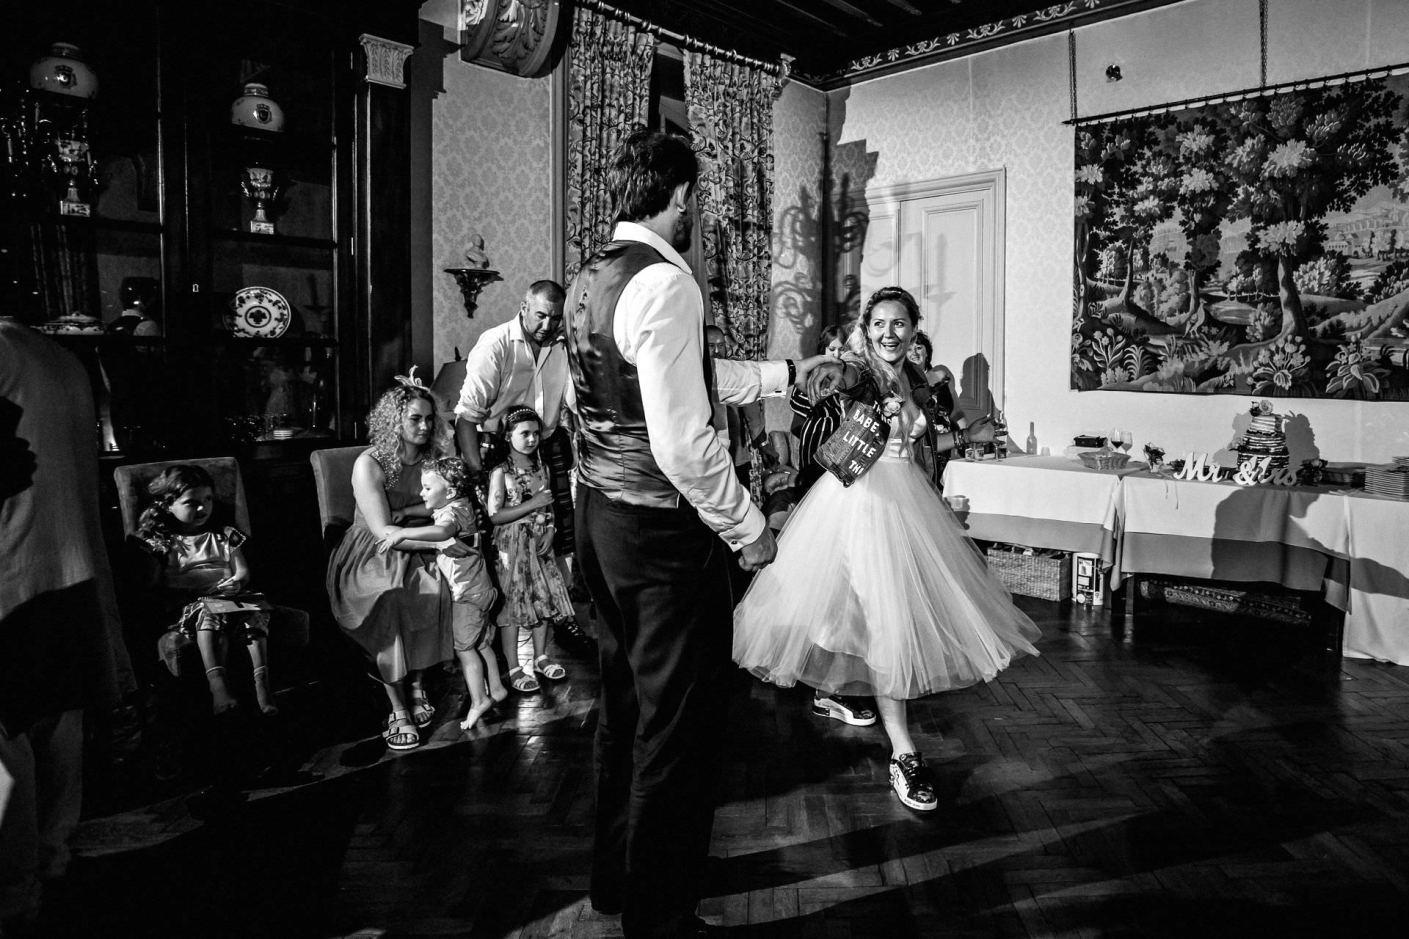 dancing, bride in denum